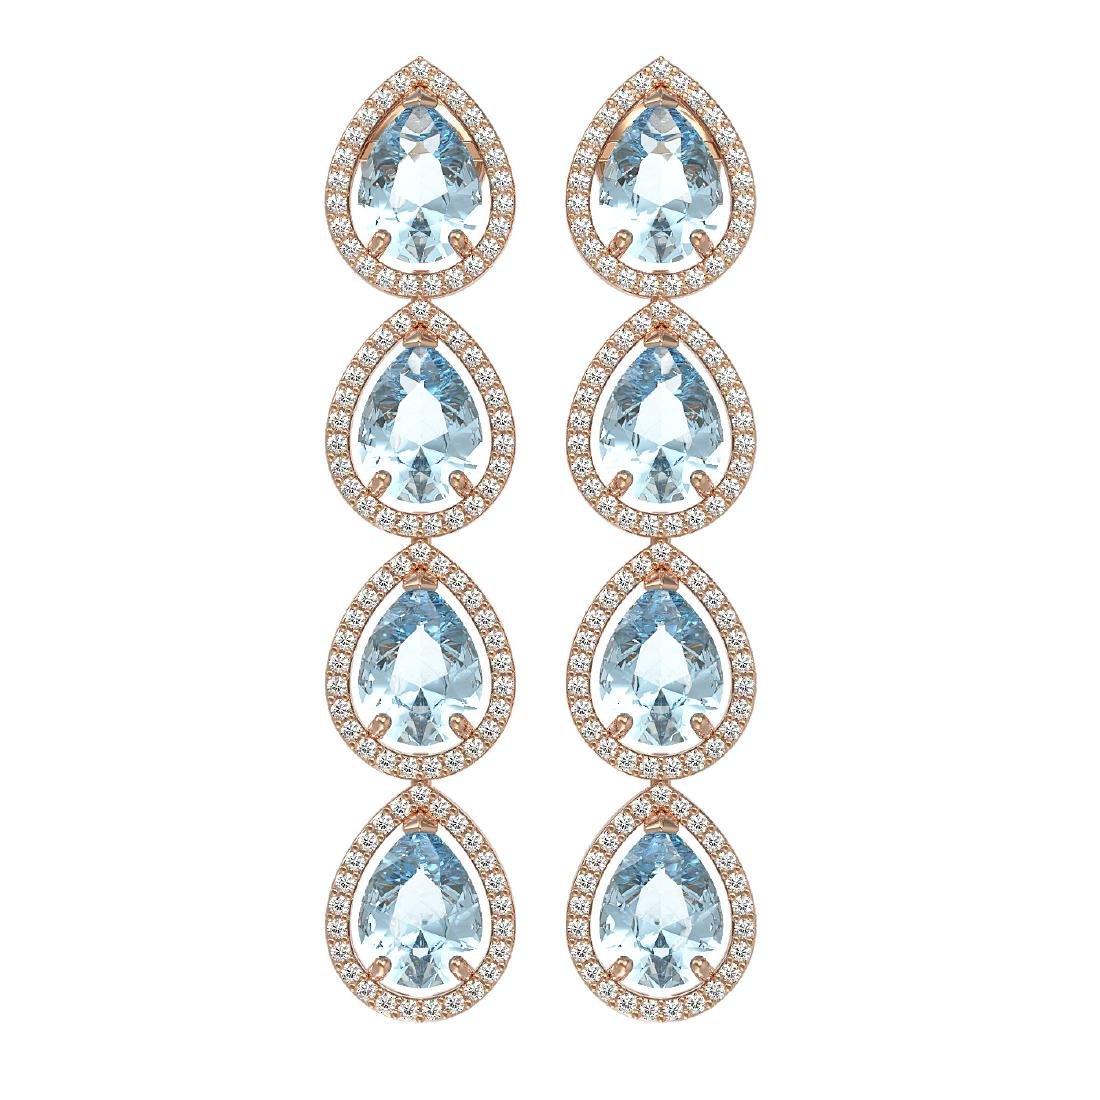 10.4 CTW Sky Topaz & Diamond Halo Earrings 10K Rose